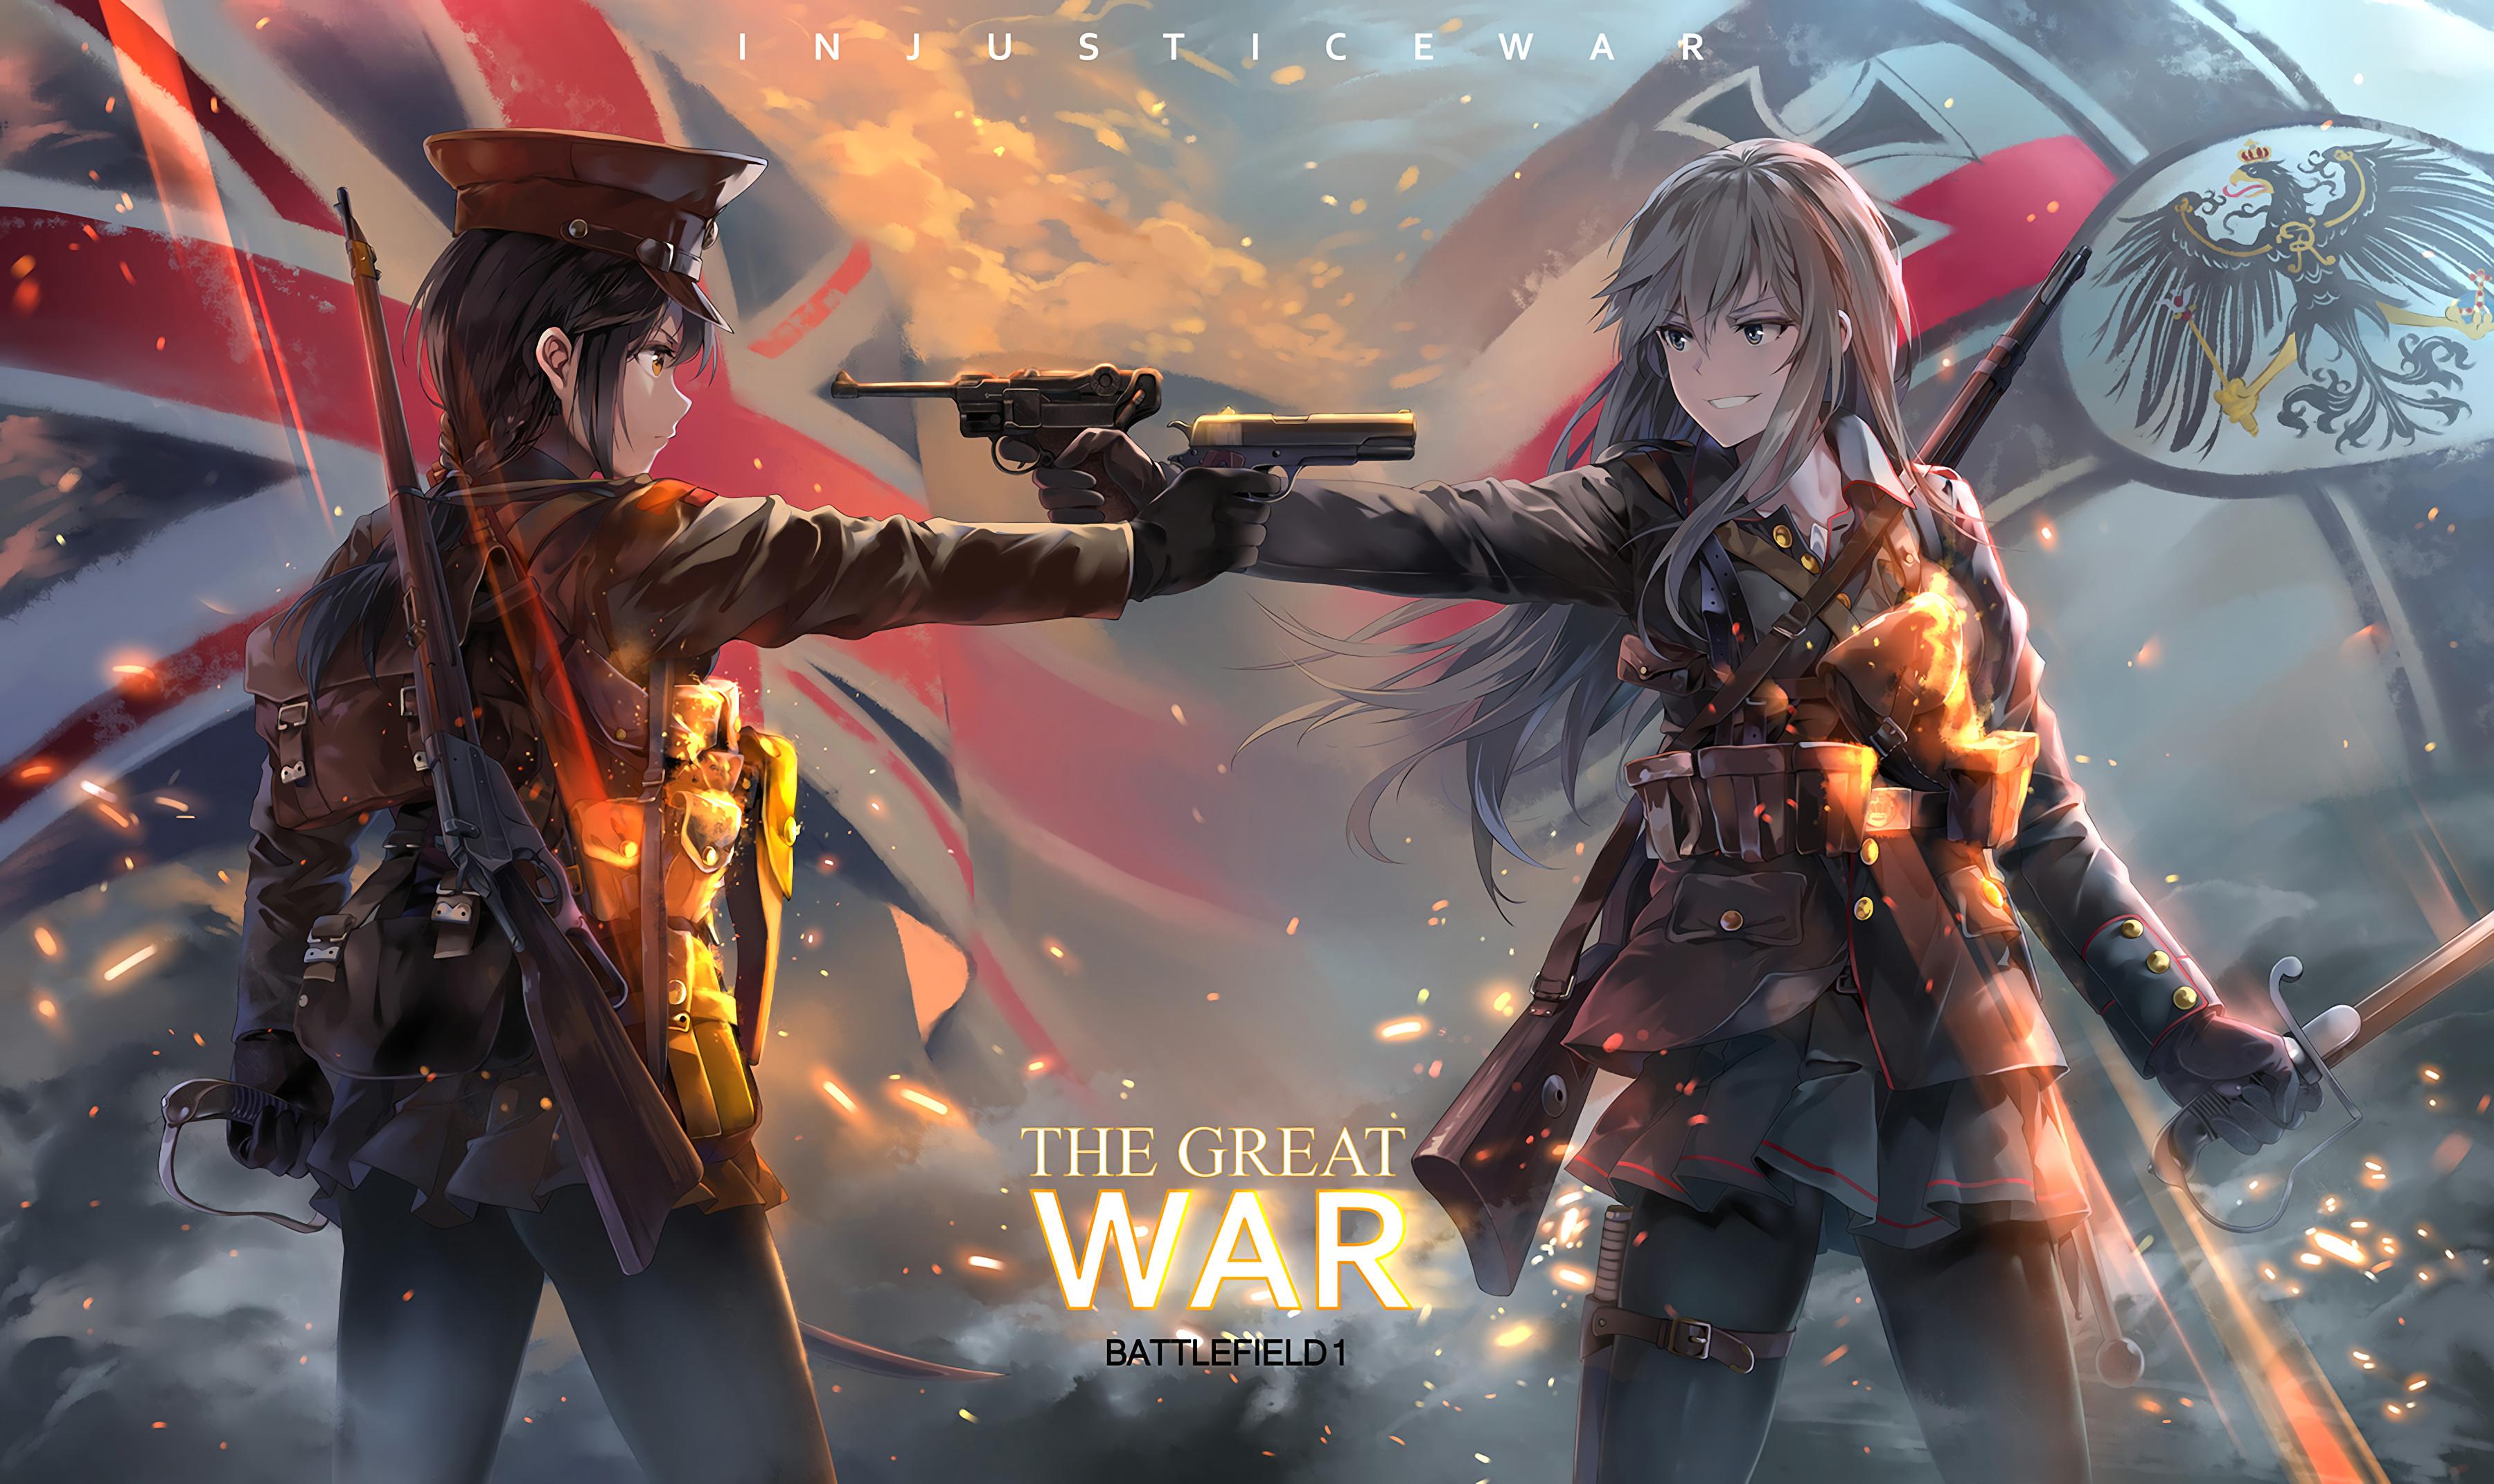 anime 3600x2142 anime anime girls battlefield battlefield 1 uniform gun weapon british army german army smiling backpacks sword military war sparks